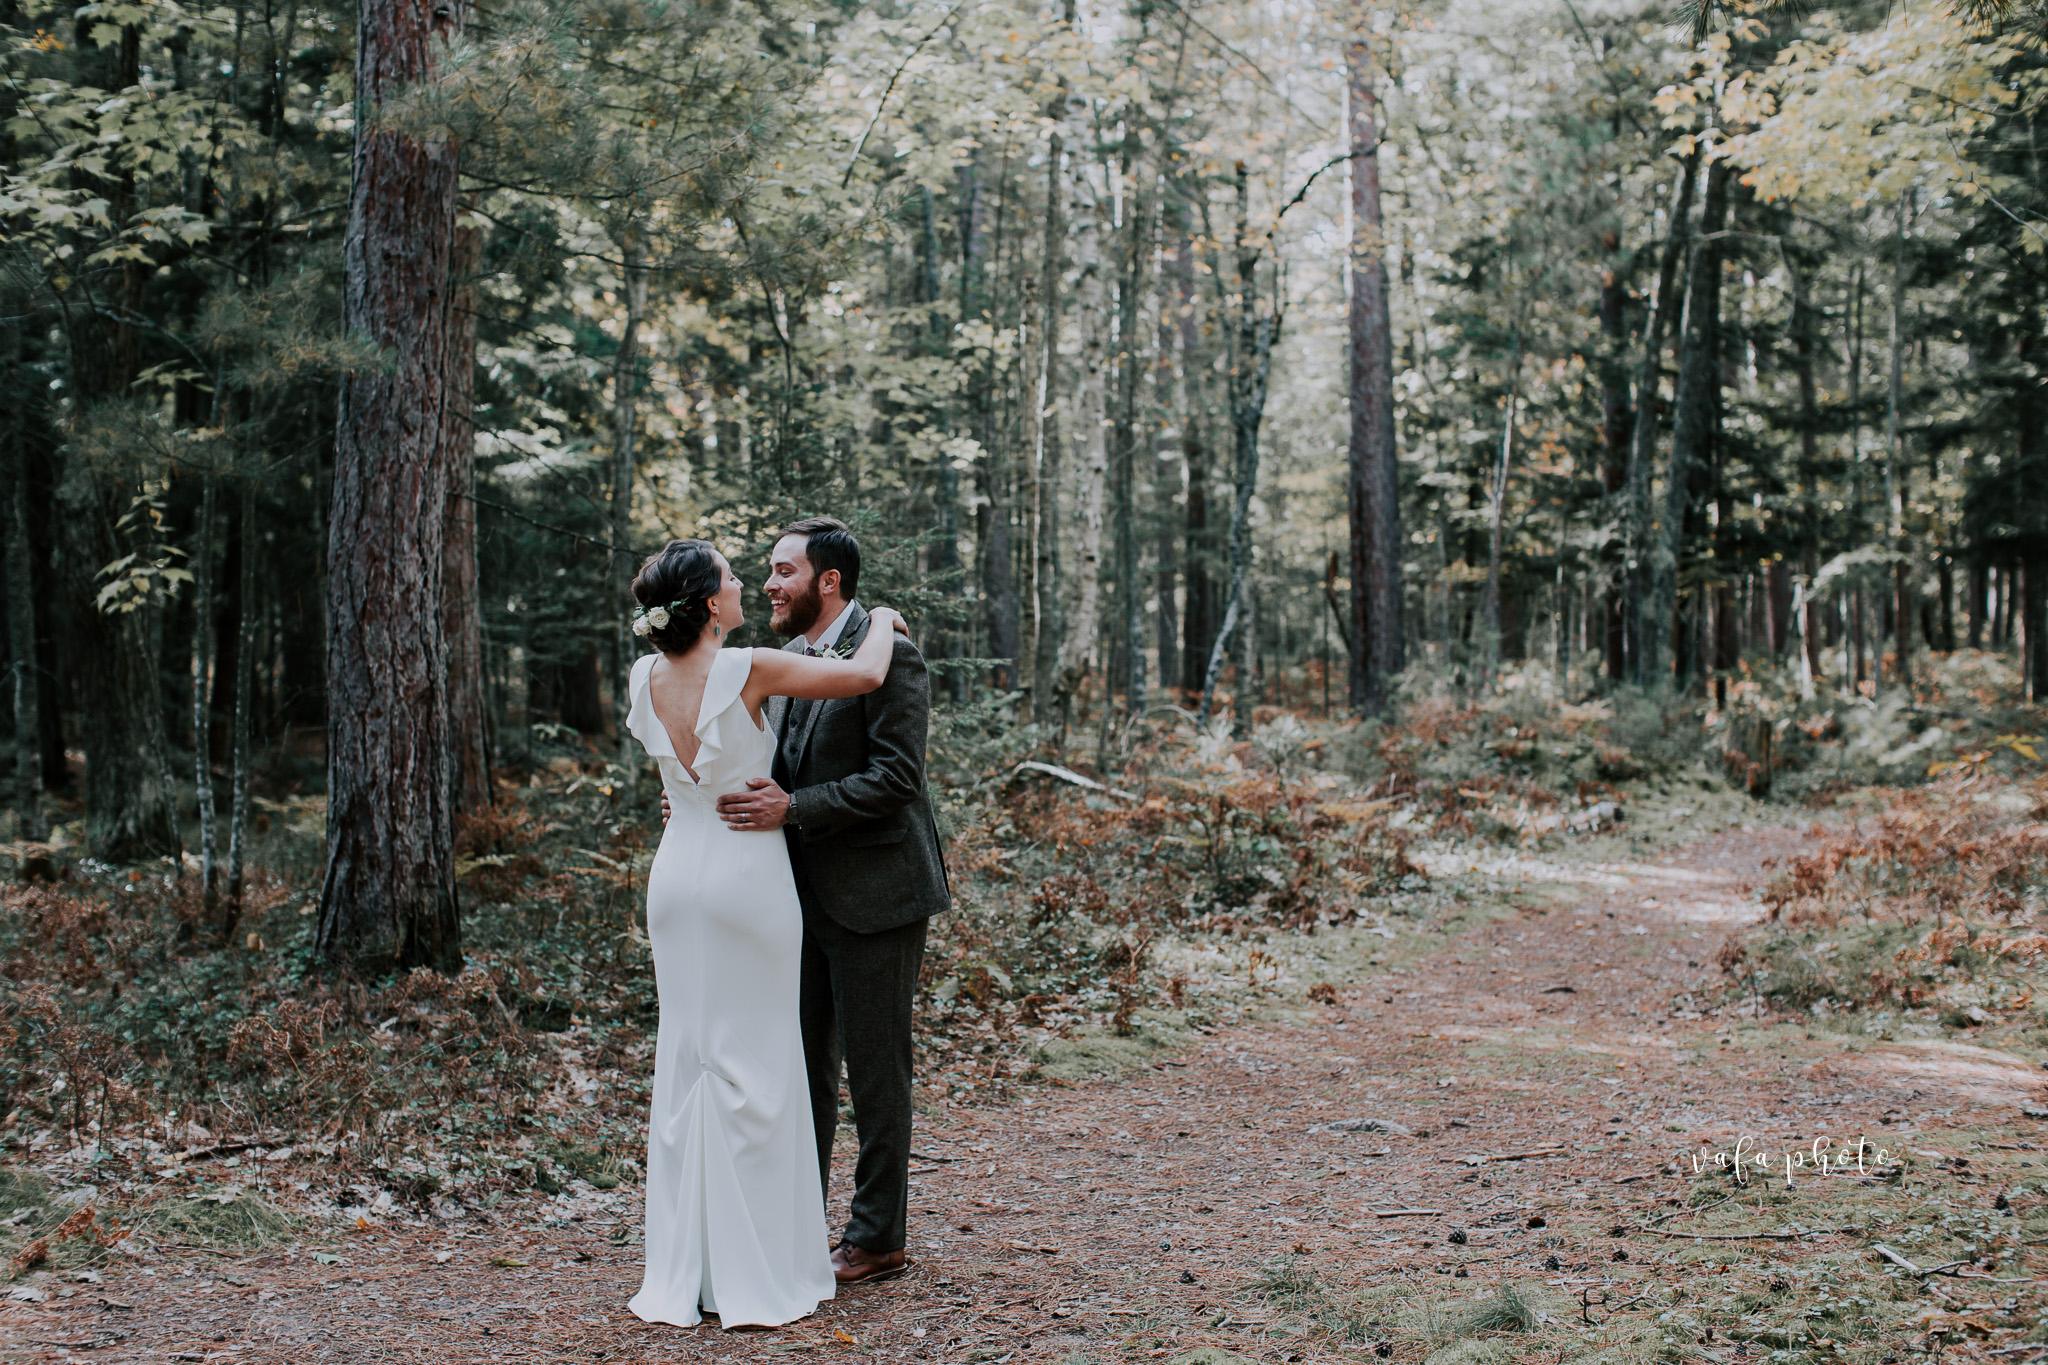 Little-Presque-Isle-Michigan-Wedding-Kim-Kyle-Vafa-Photo-15.jpg